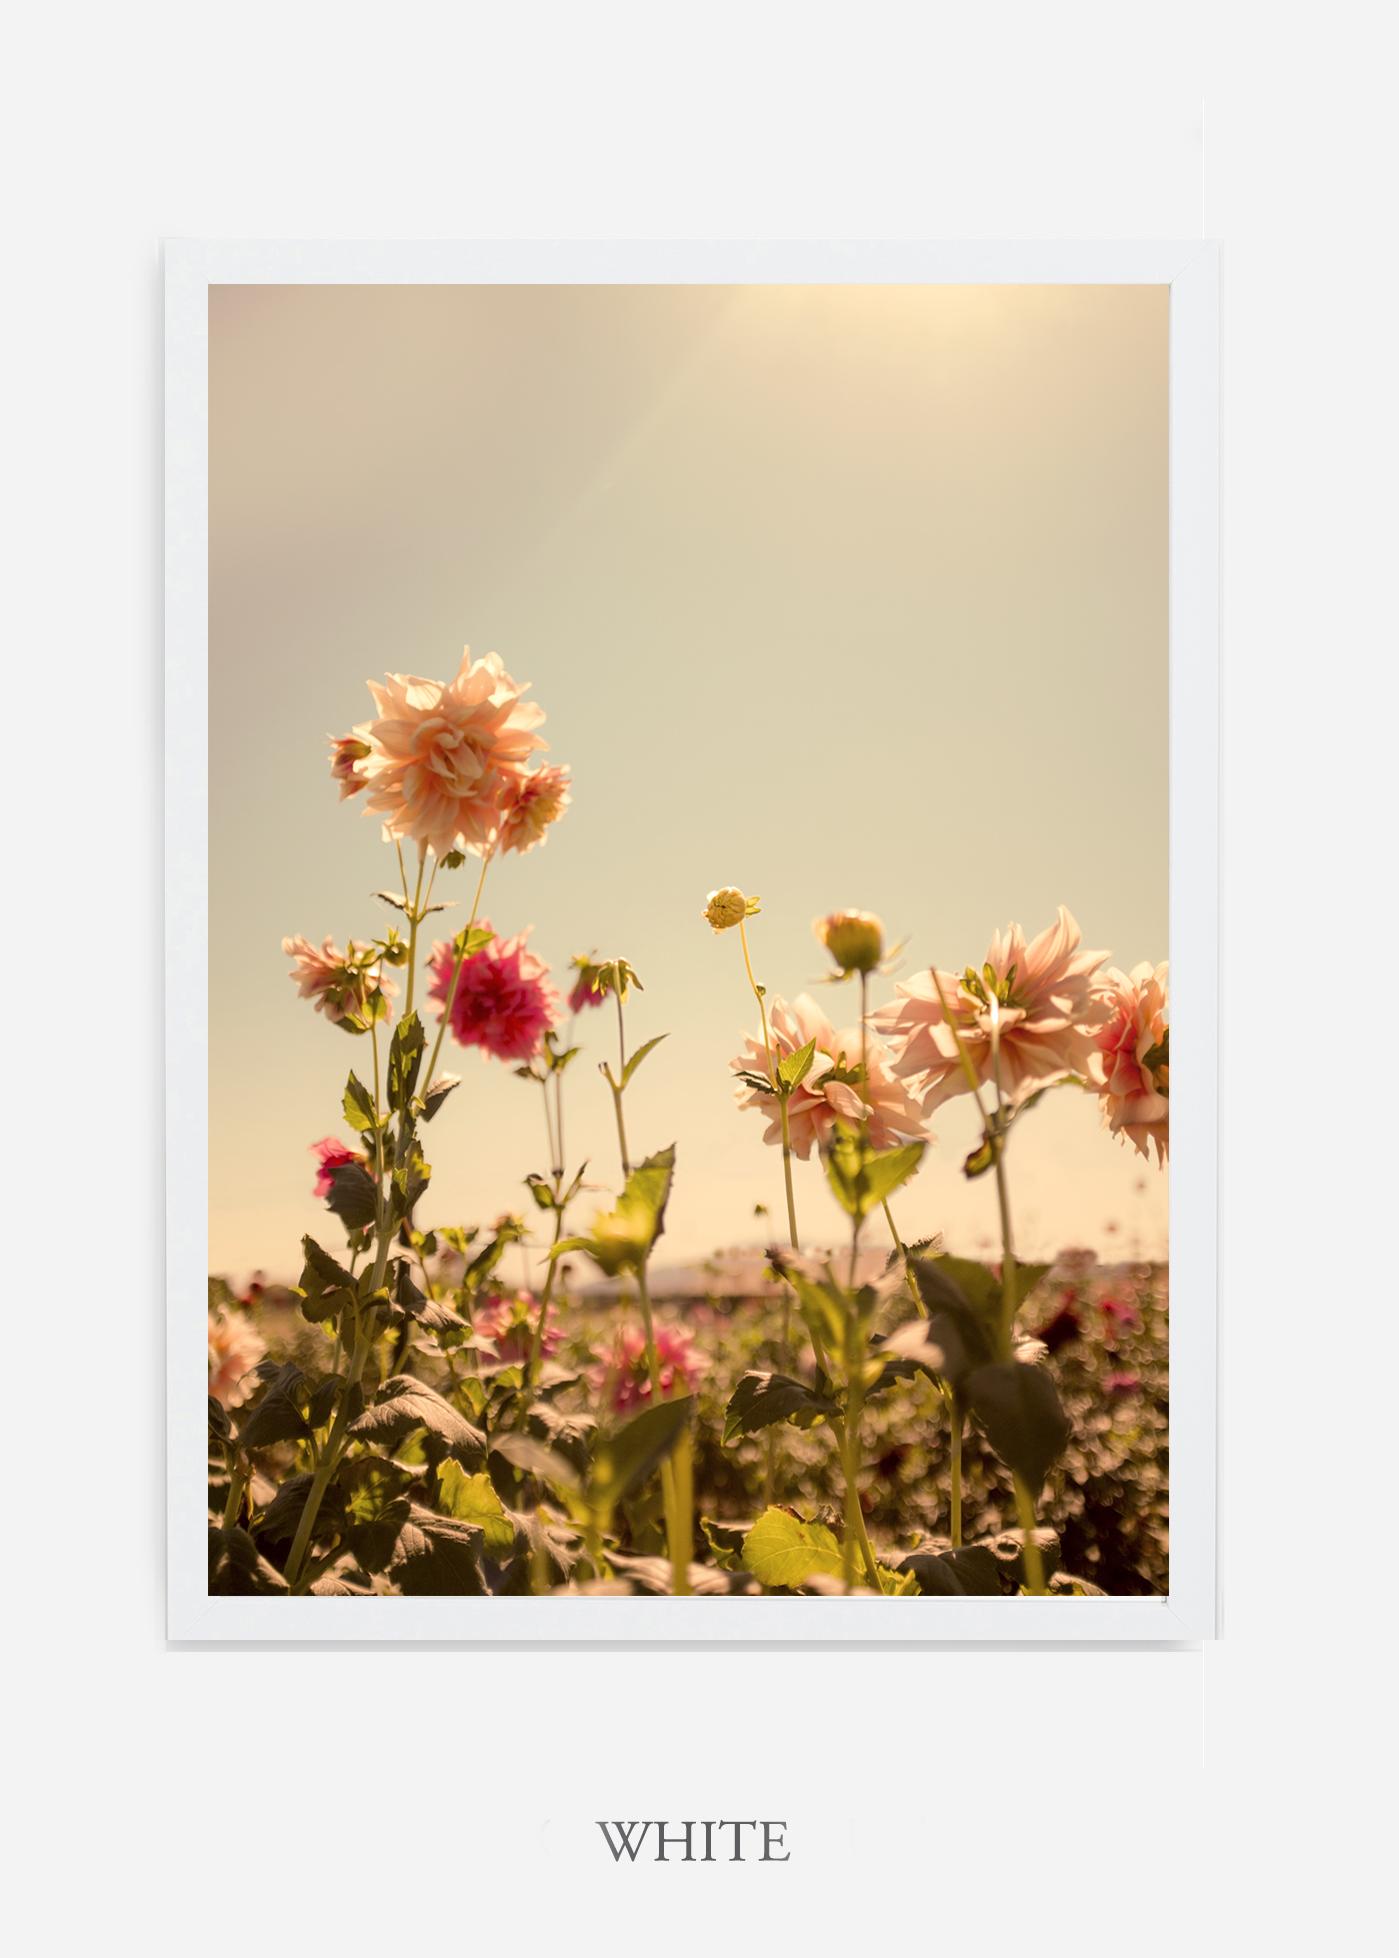 DahliaNo.3_whiteframe__NoMat_interiordesign_botanicalprint_art.jpg